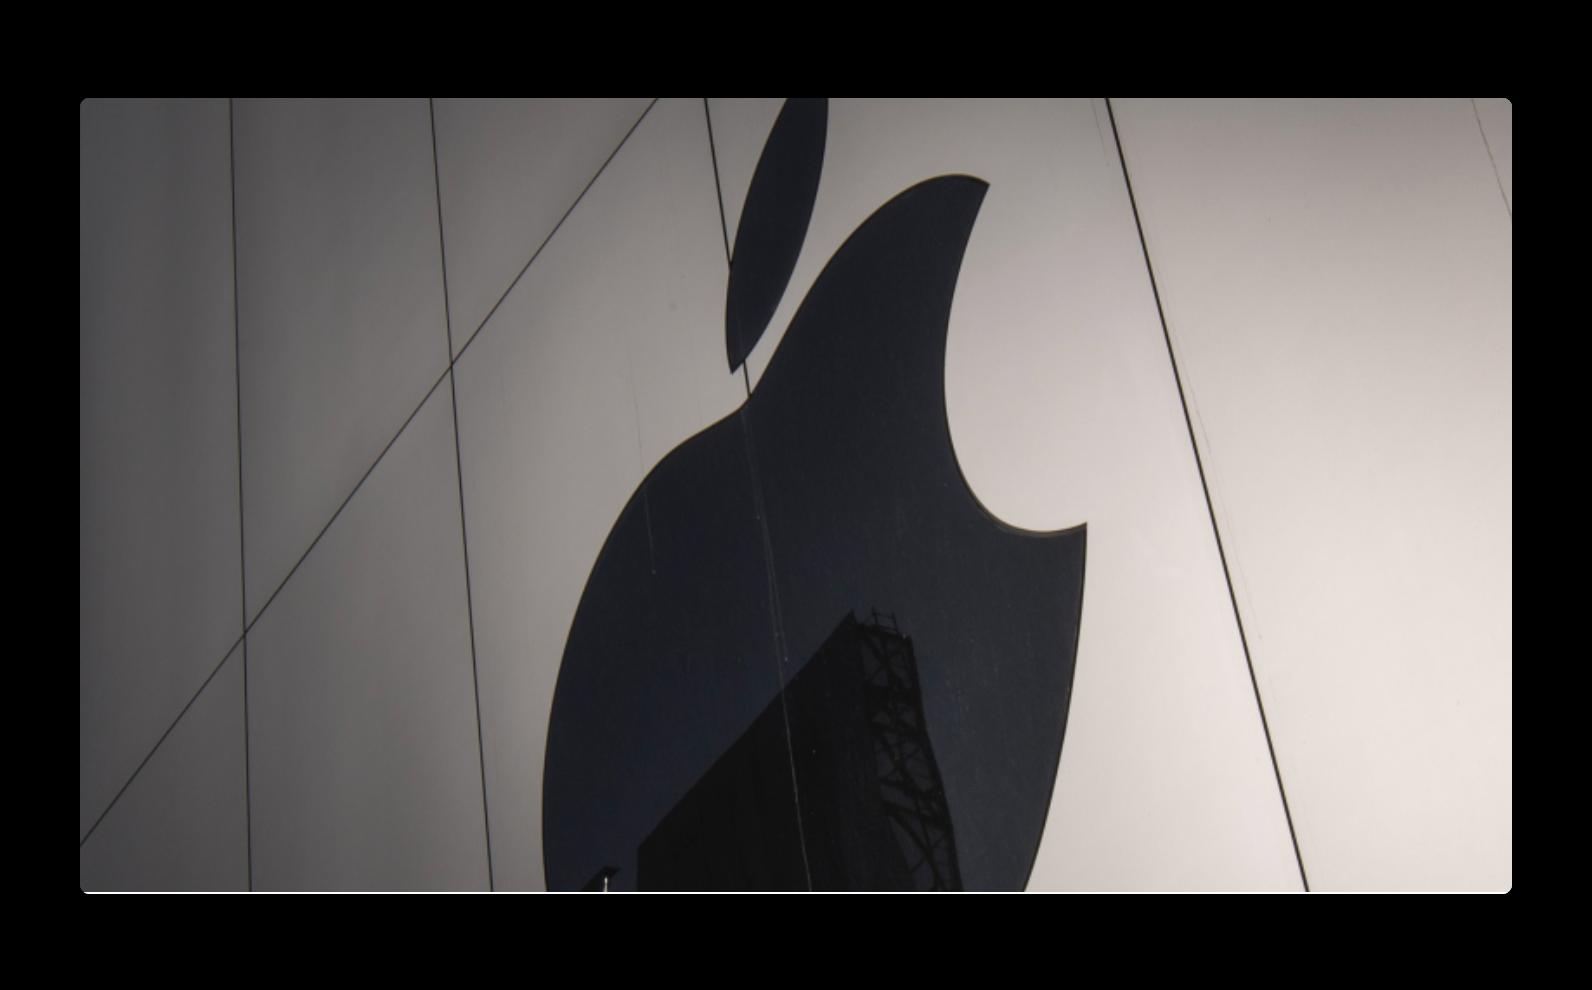 Appleのエグゼクティブチームが大きく変化し、複数のプロジェクトが保留になる